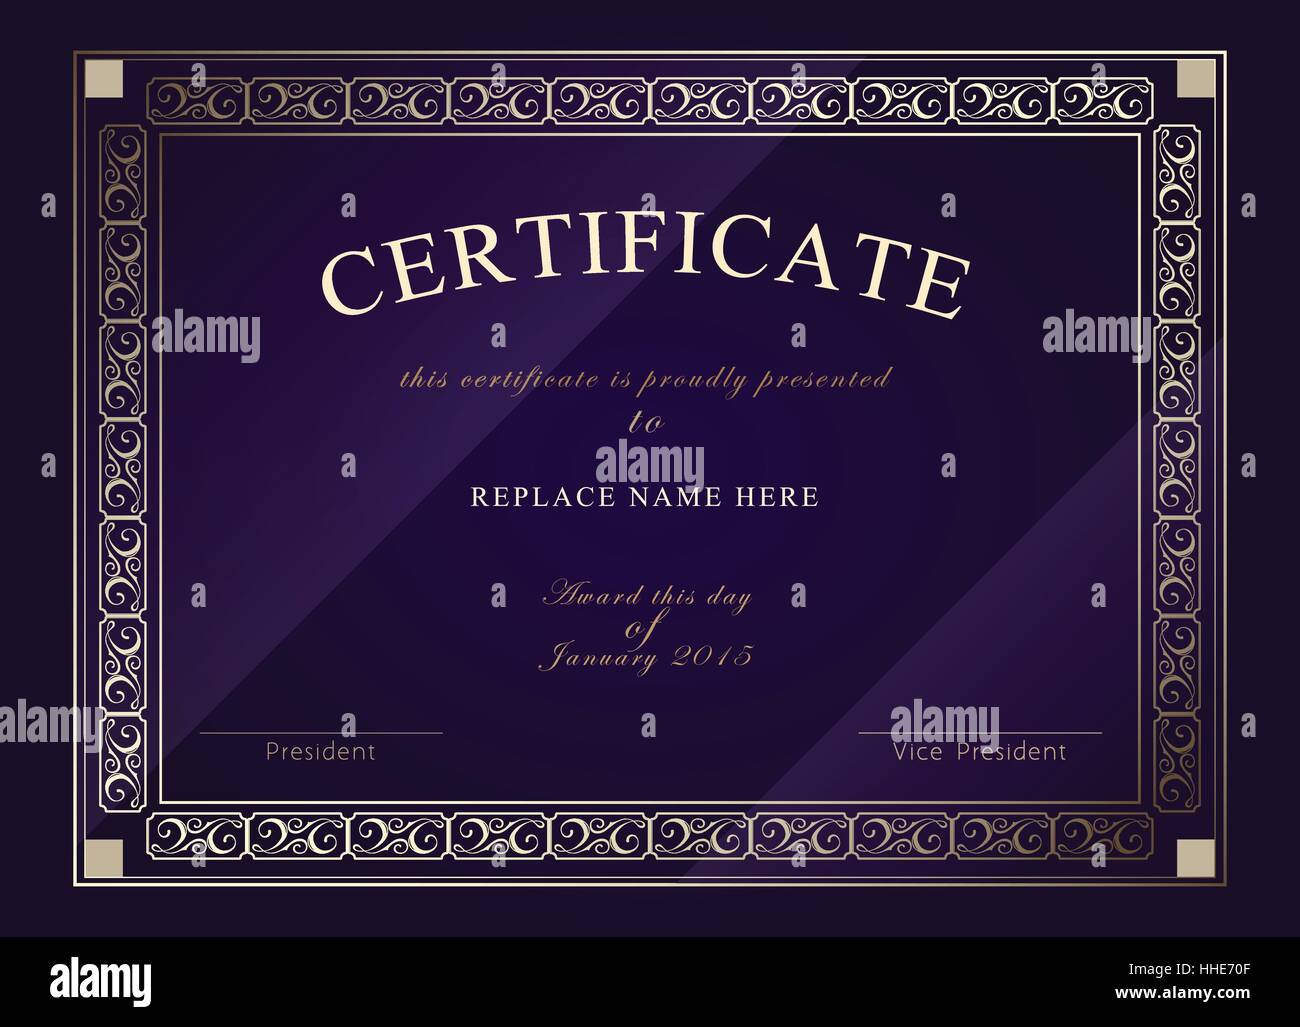 Certificate Border Stockfotos & Certificate Border Bilder - Alamy